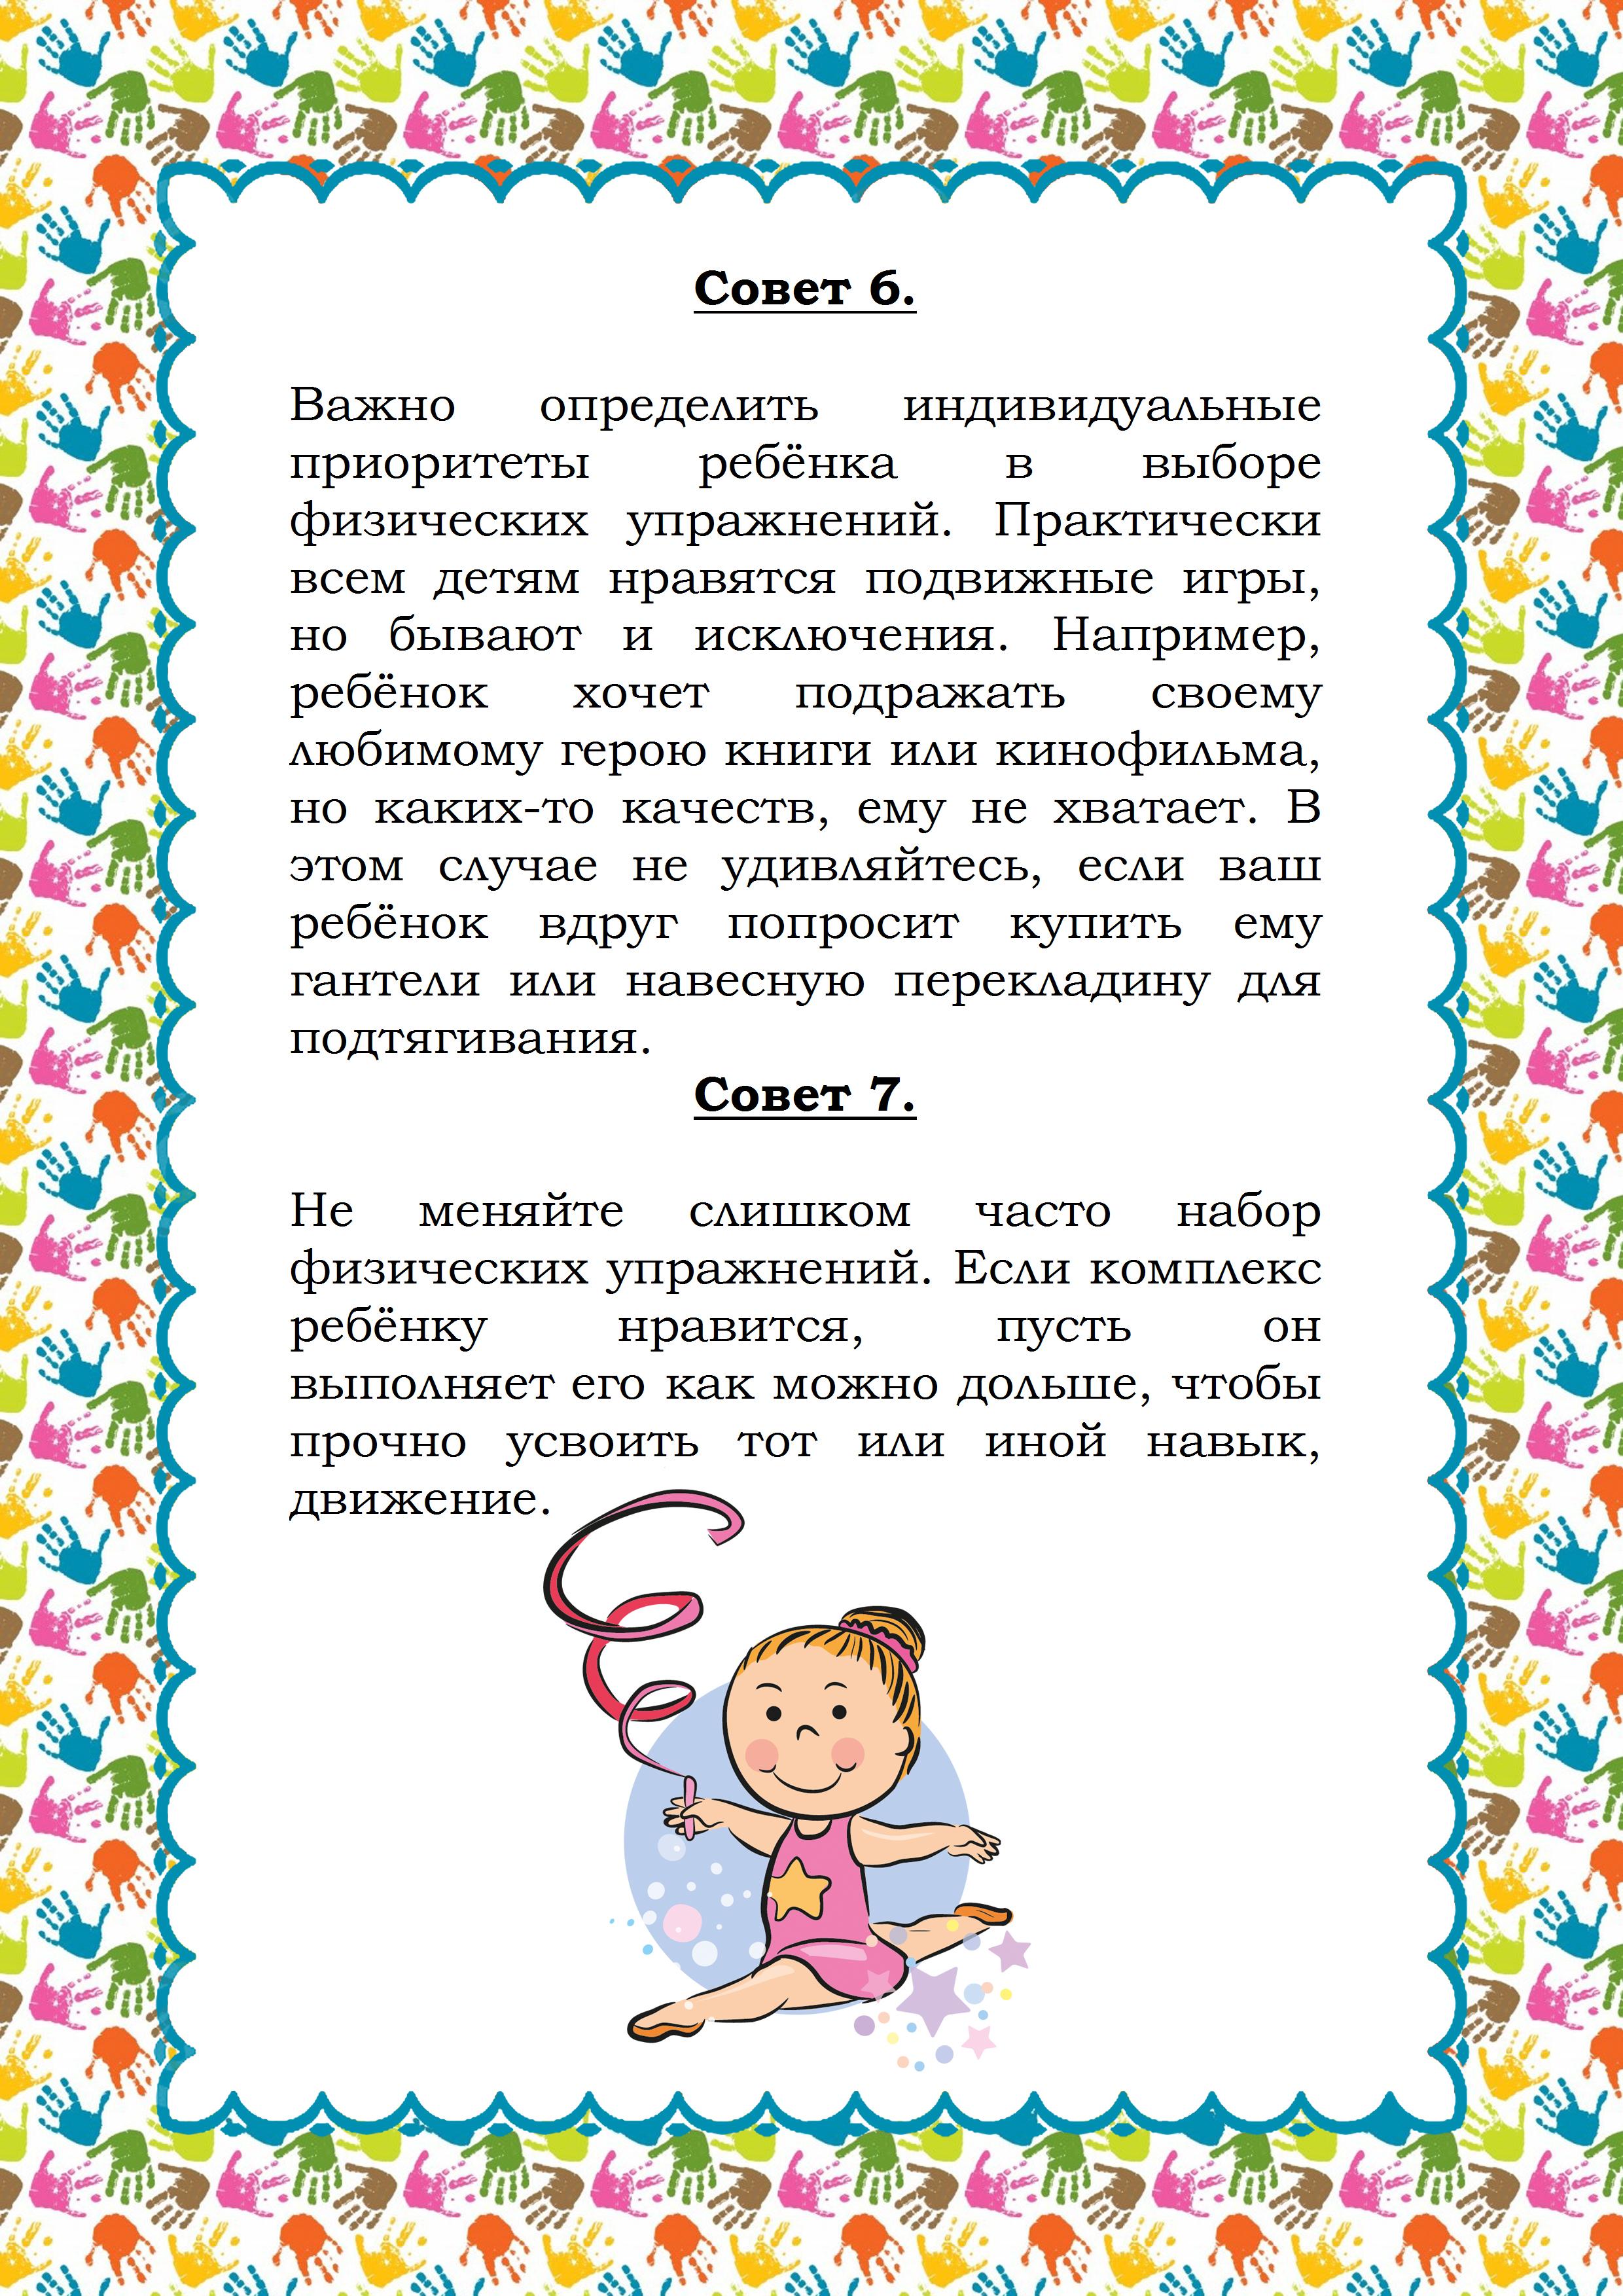 hello_html_a1c3c72.jpg